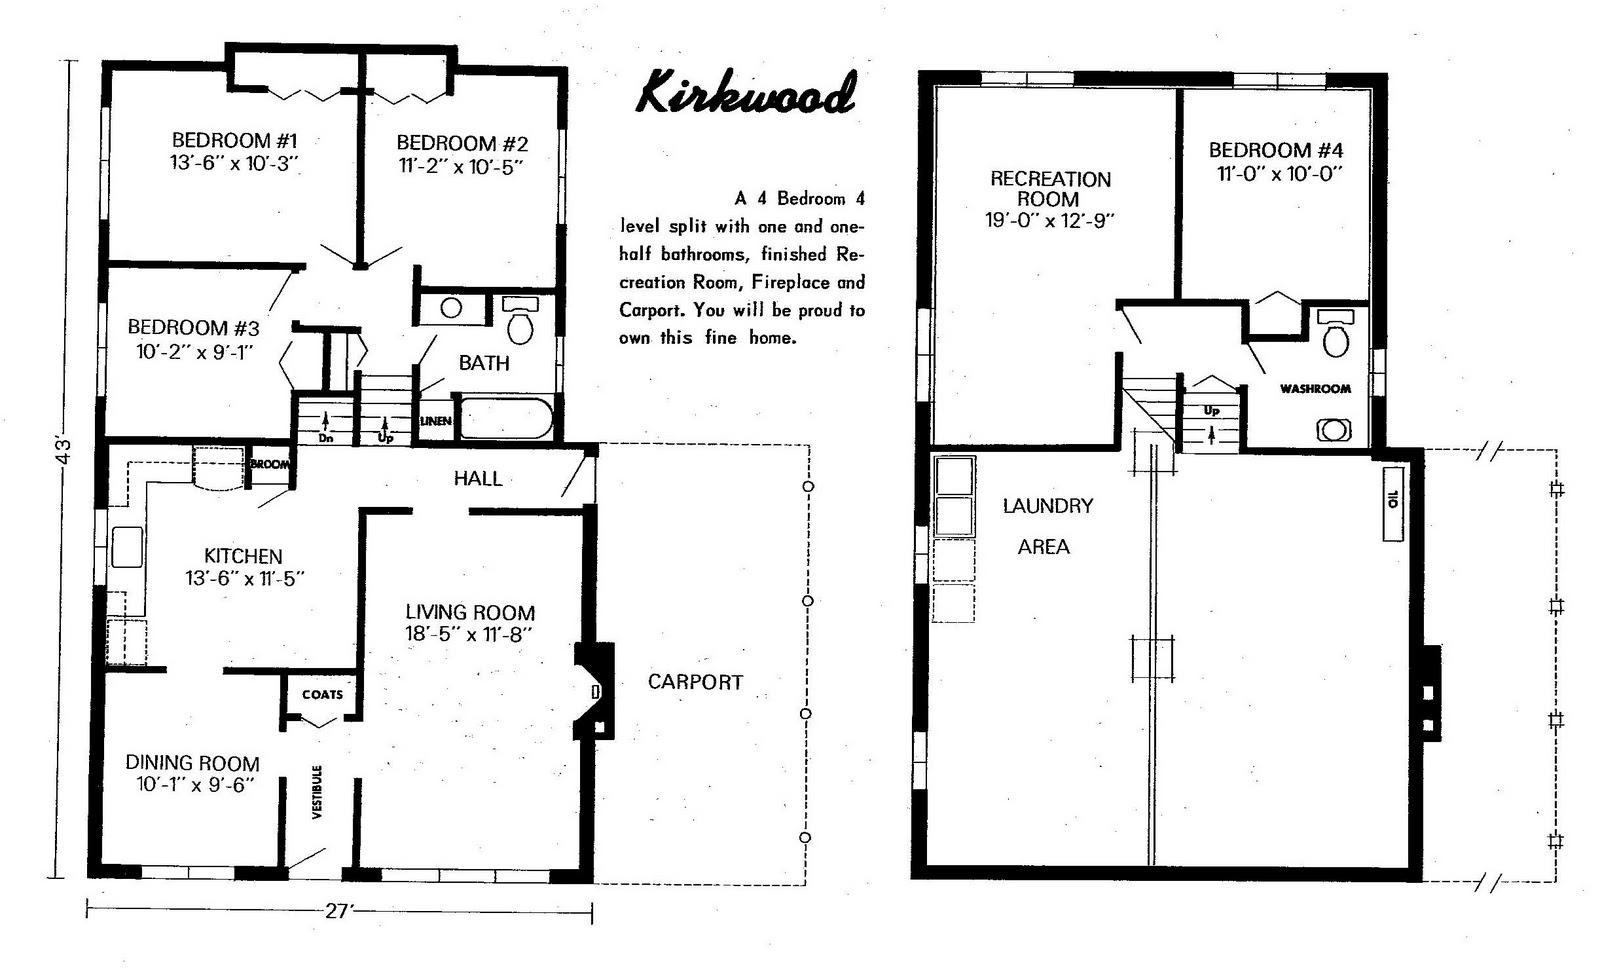 holitzner homes floor plans house design plans holitzner homes floor plans